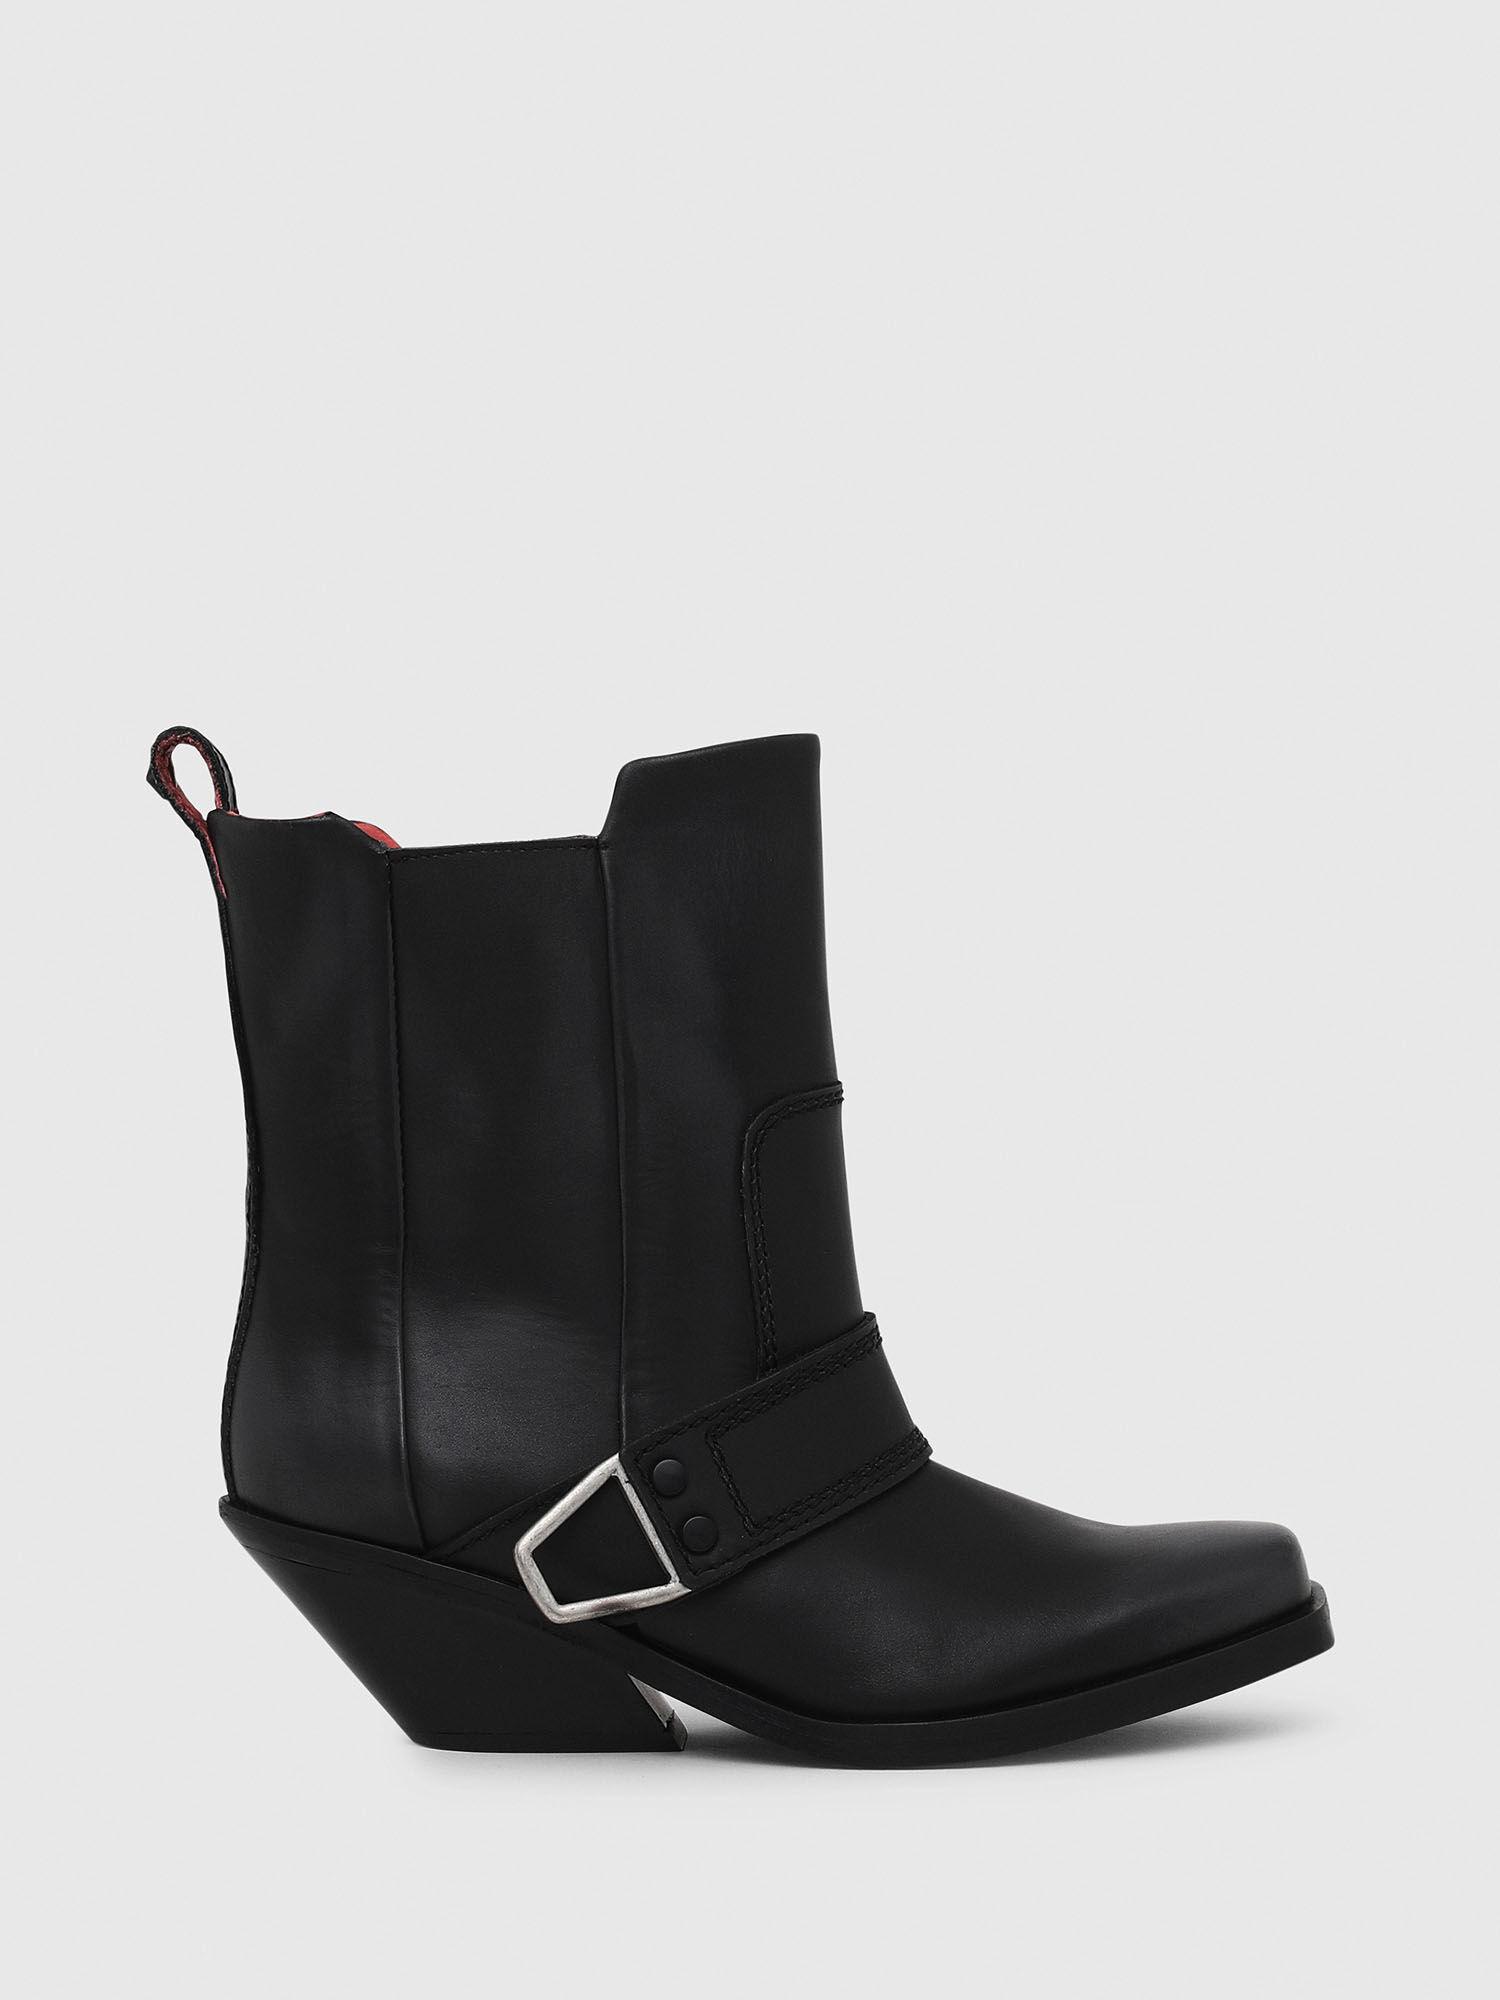 4a438dc0f Clar Bajos 2017 Bajos Mujer Zapatos 2017 Clar Zapatos Mujer Hvw4apq7n